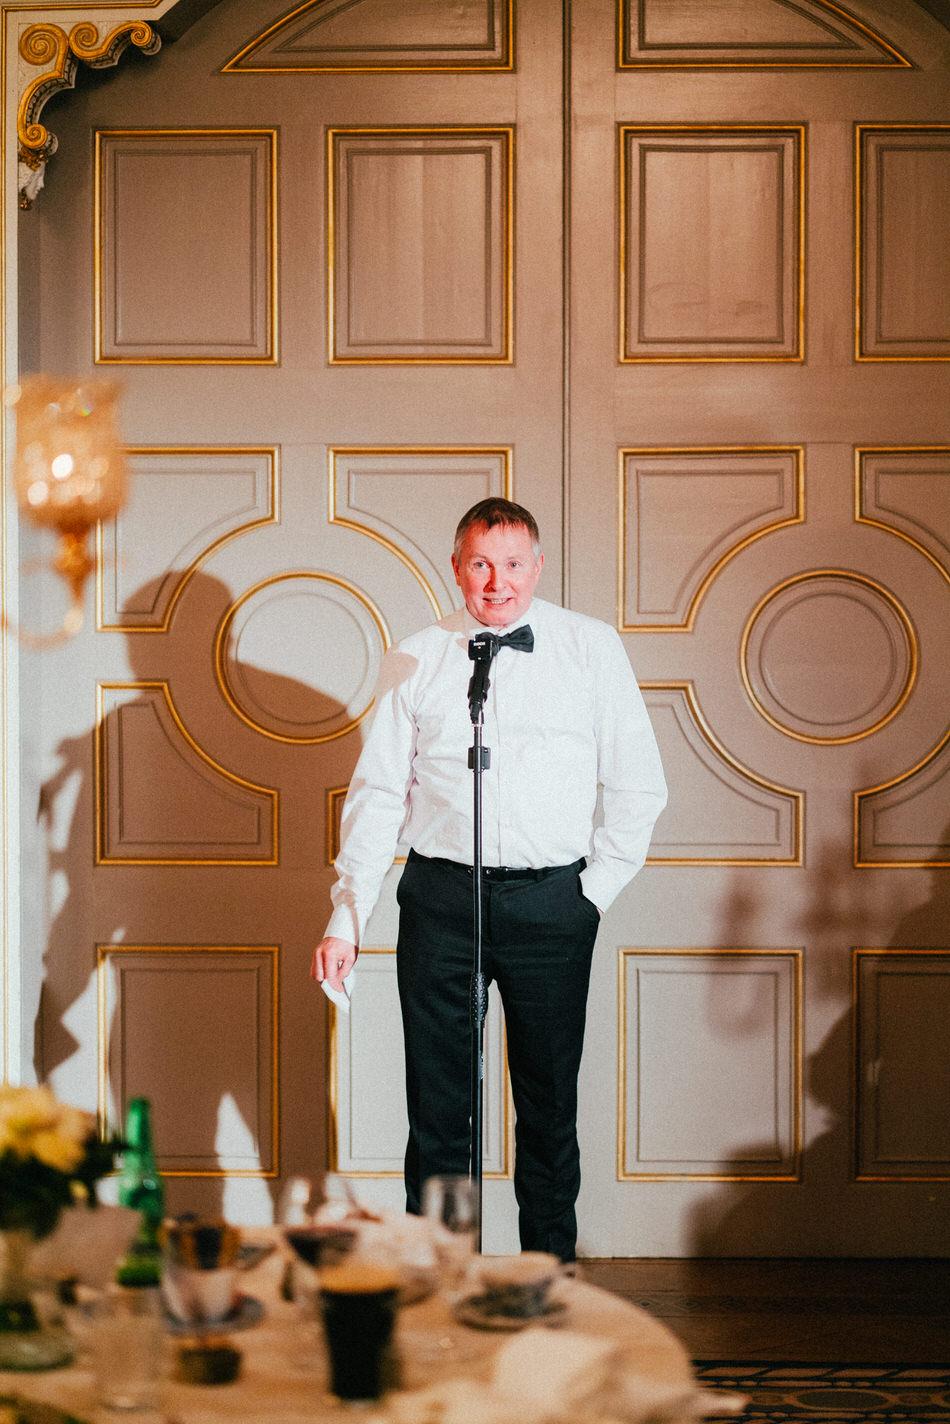 Castle-wedding-ireland-photos- 0286 219